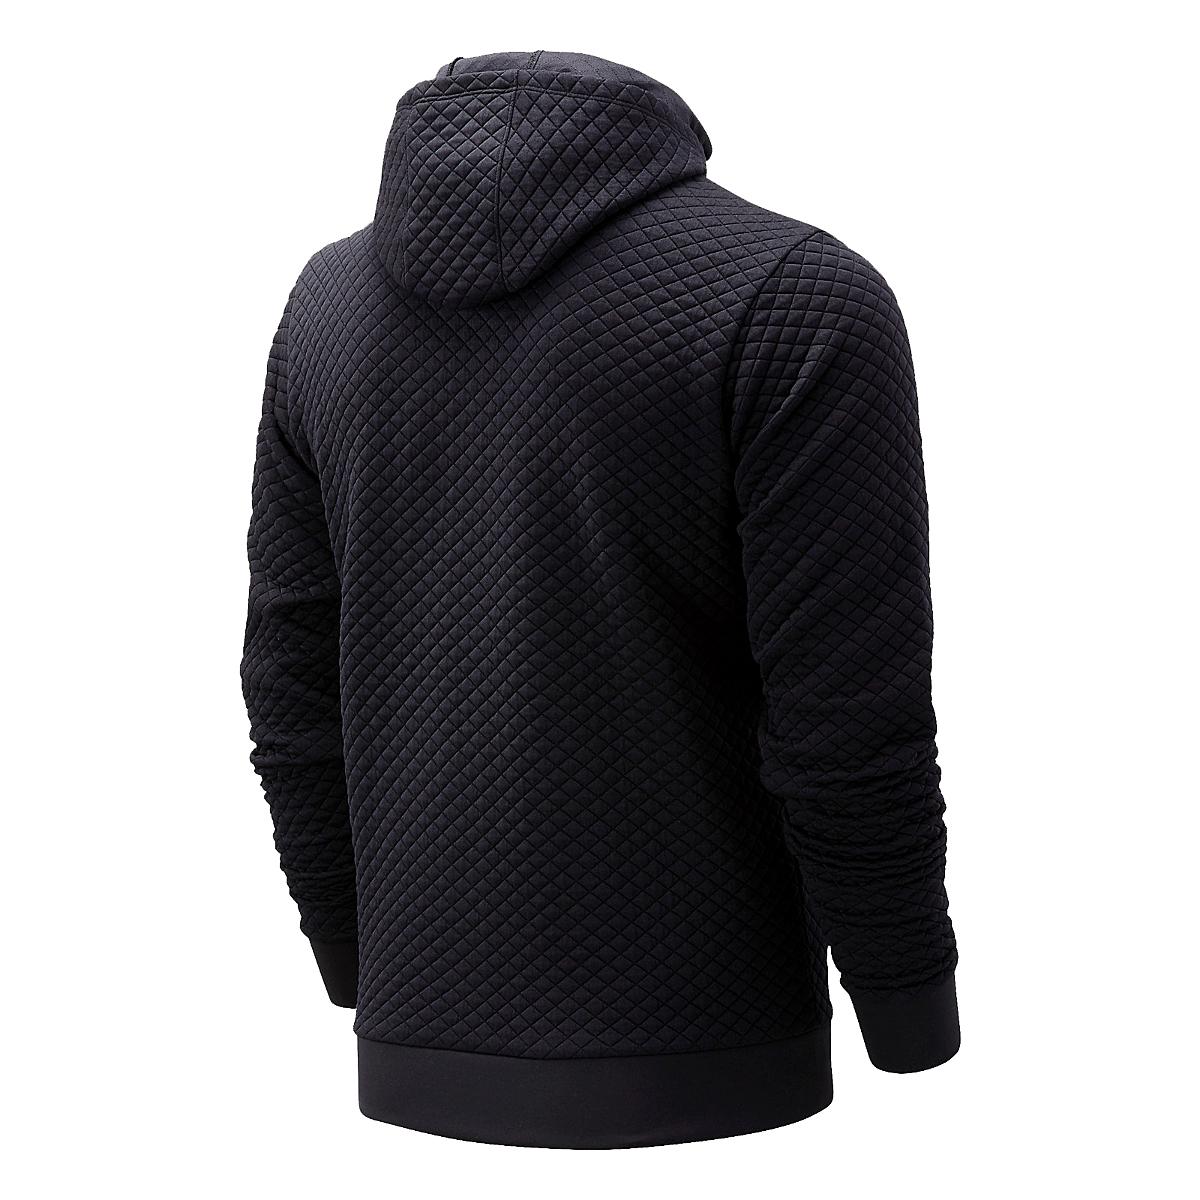 Men's New Balance Heatloft Full Zip - Color: Black - Size: S, Black, large, image 2